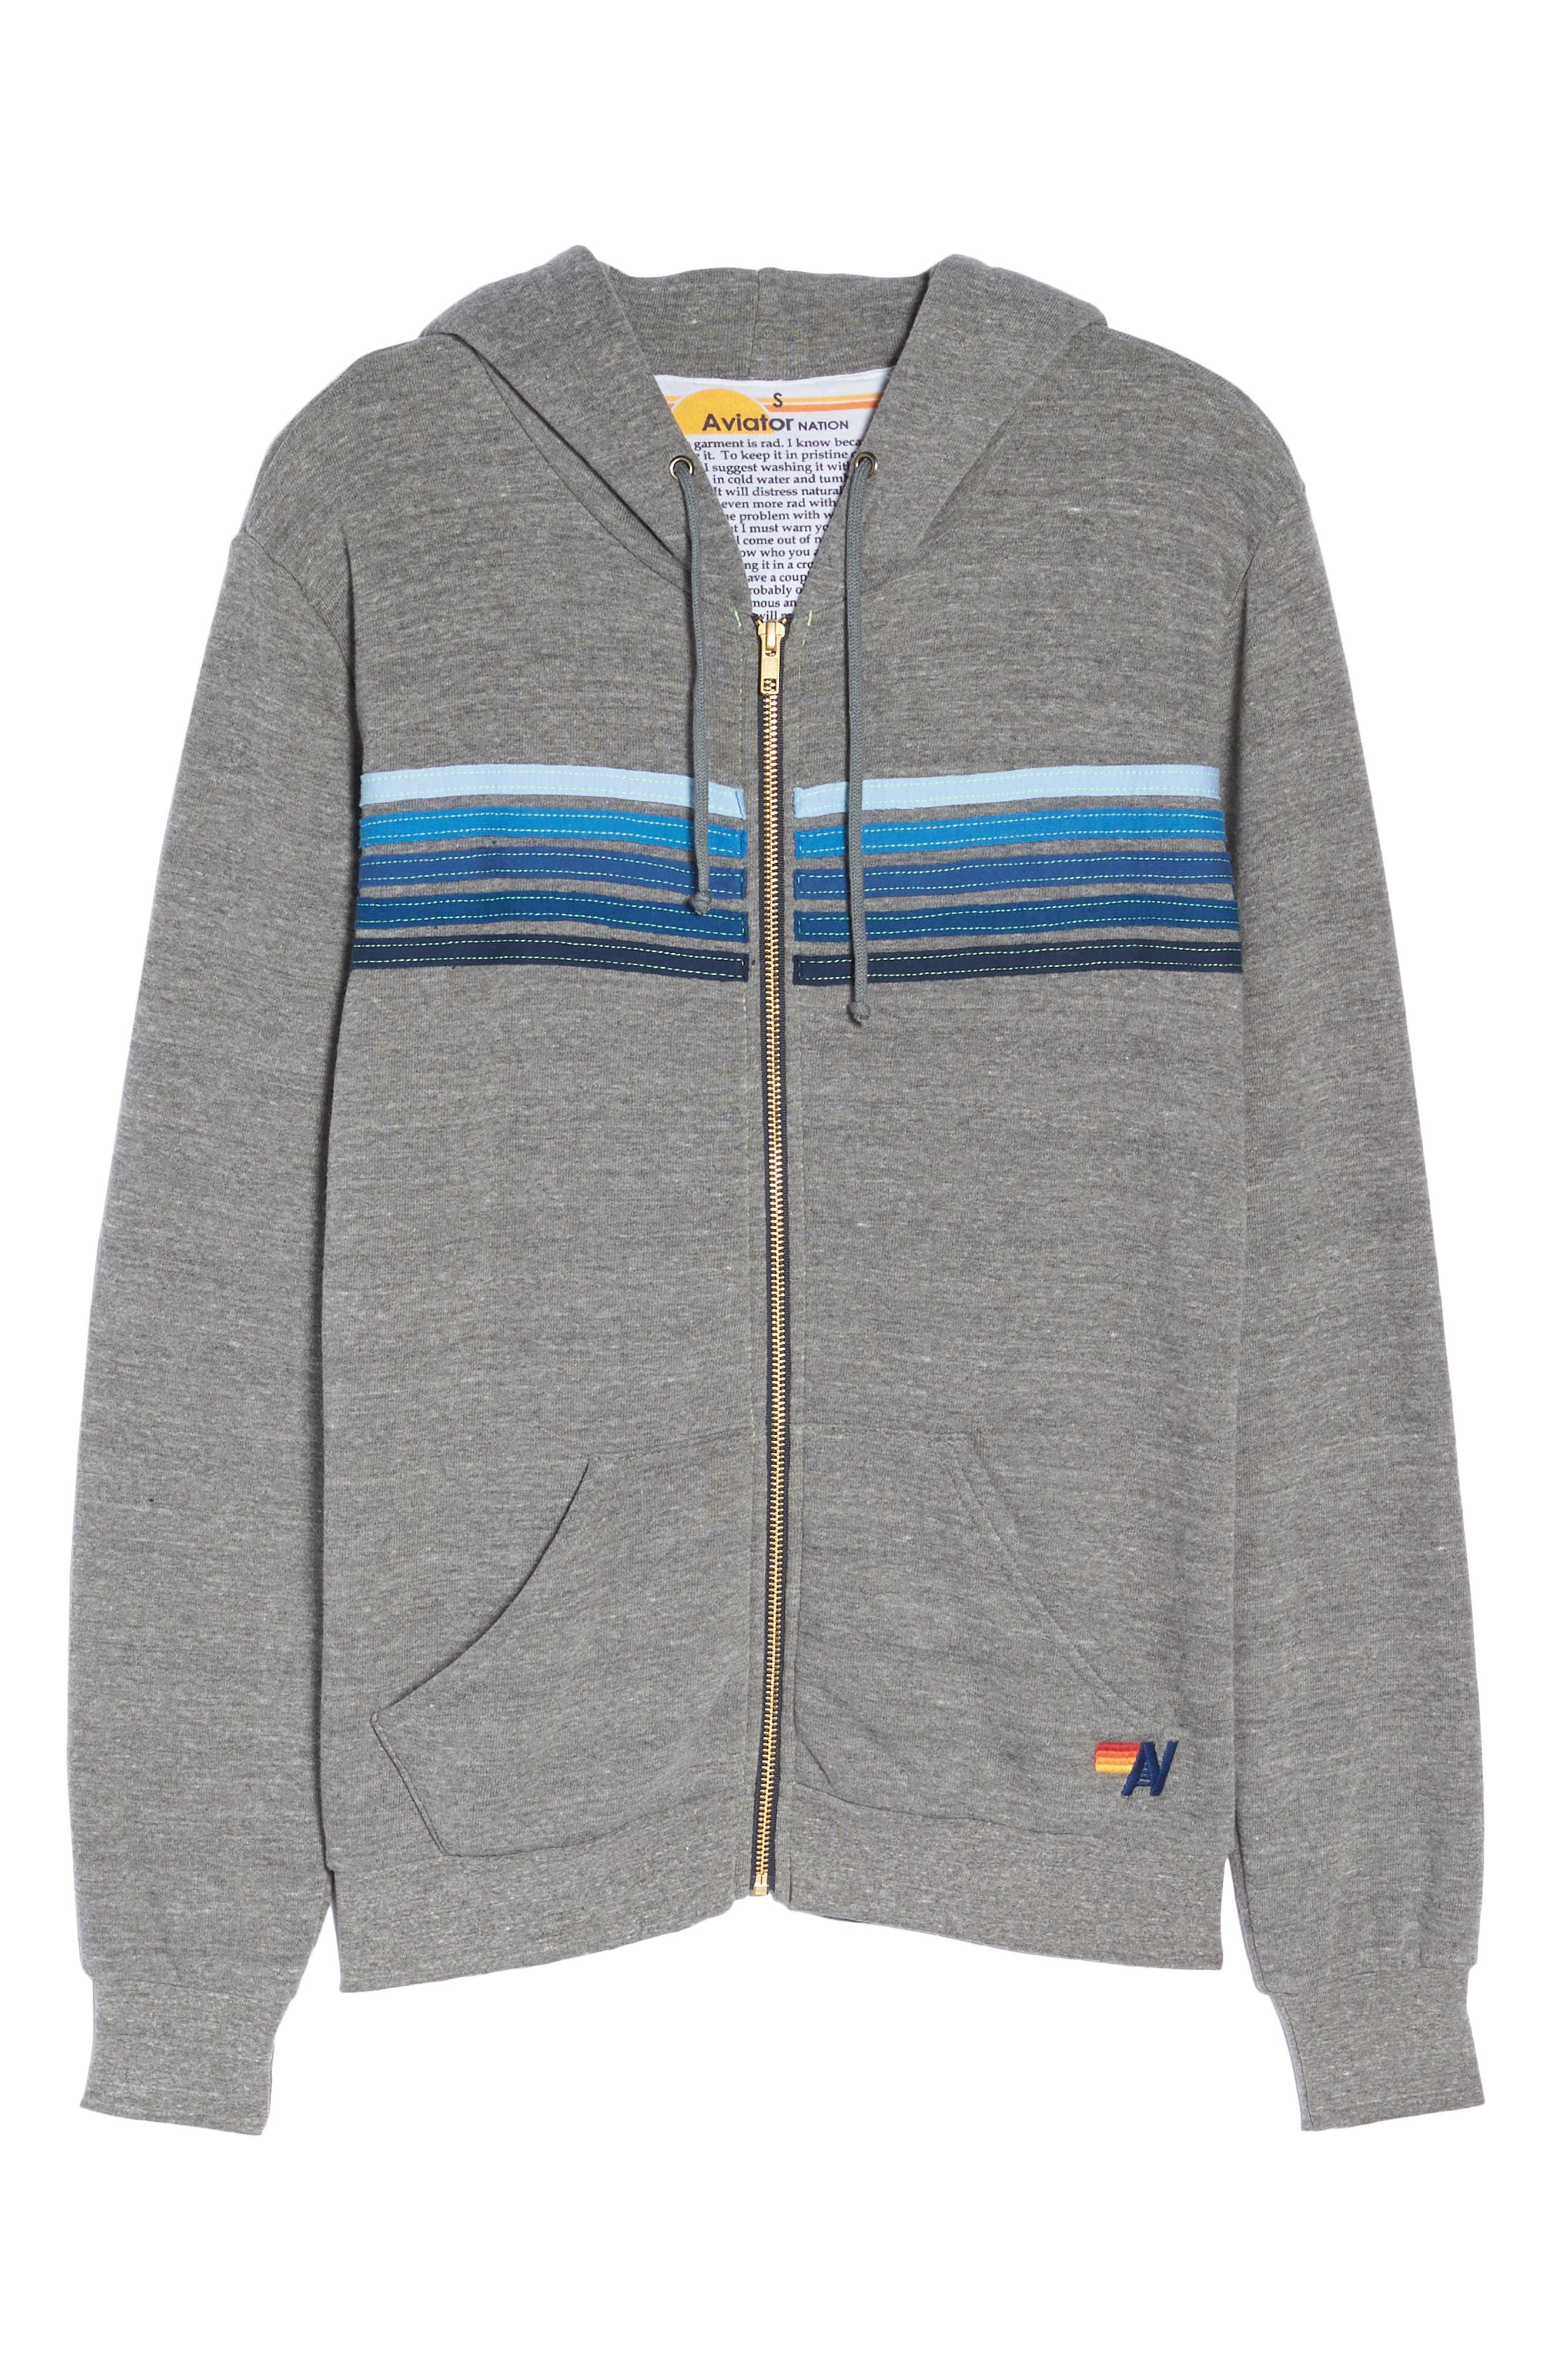 5-Stripe Zip Hoodie,                             Alternate thumbnail 7, color,                             HEATHER GREY/ BLUE STRIPES